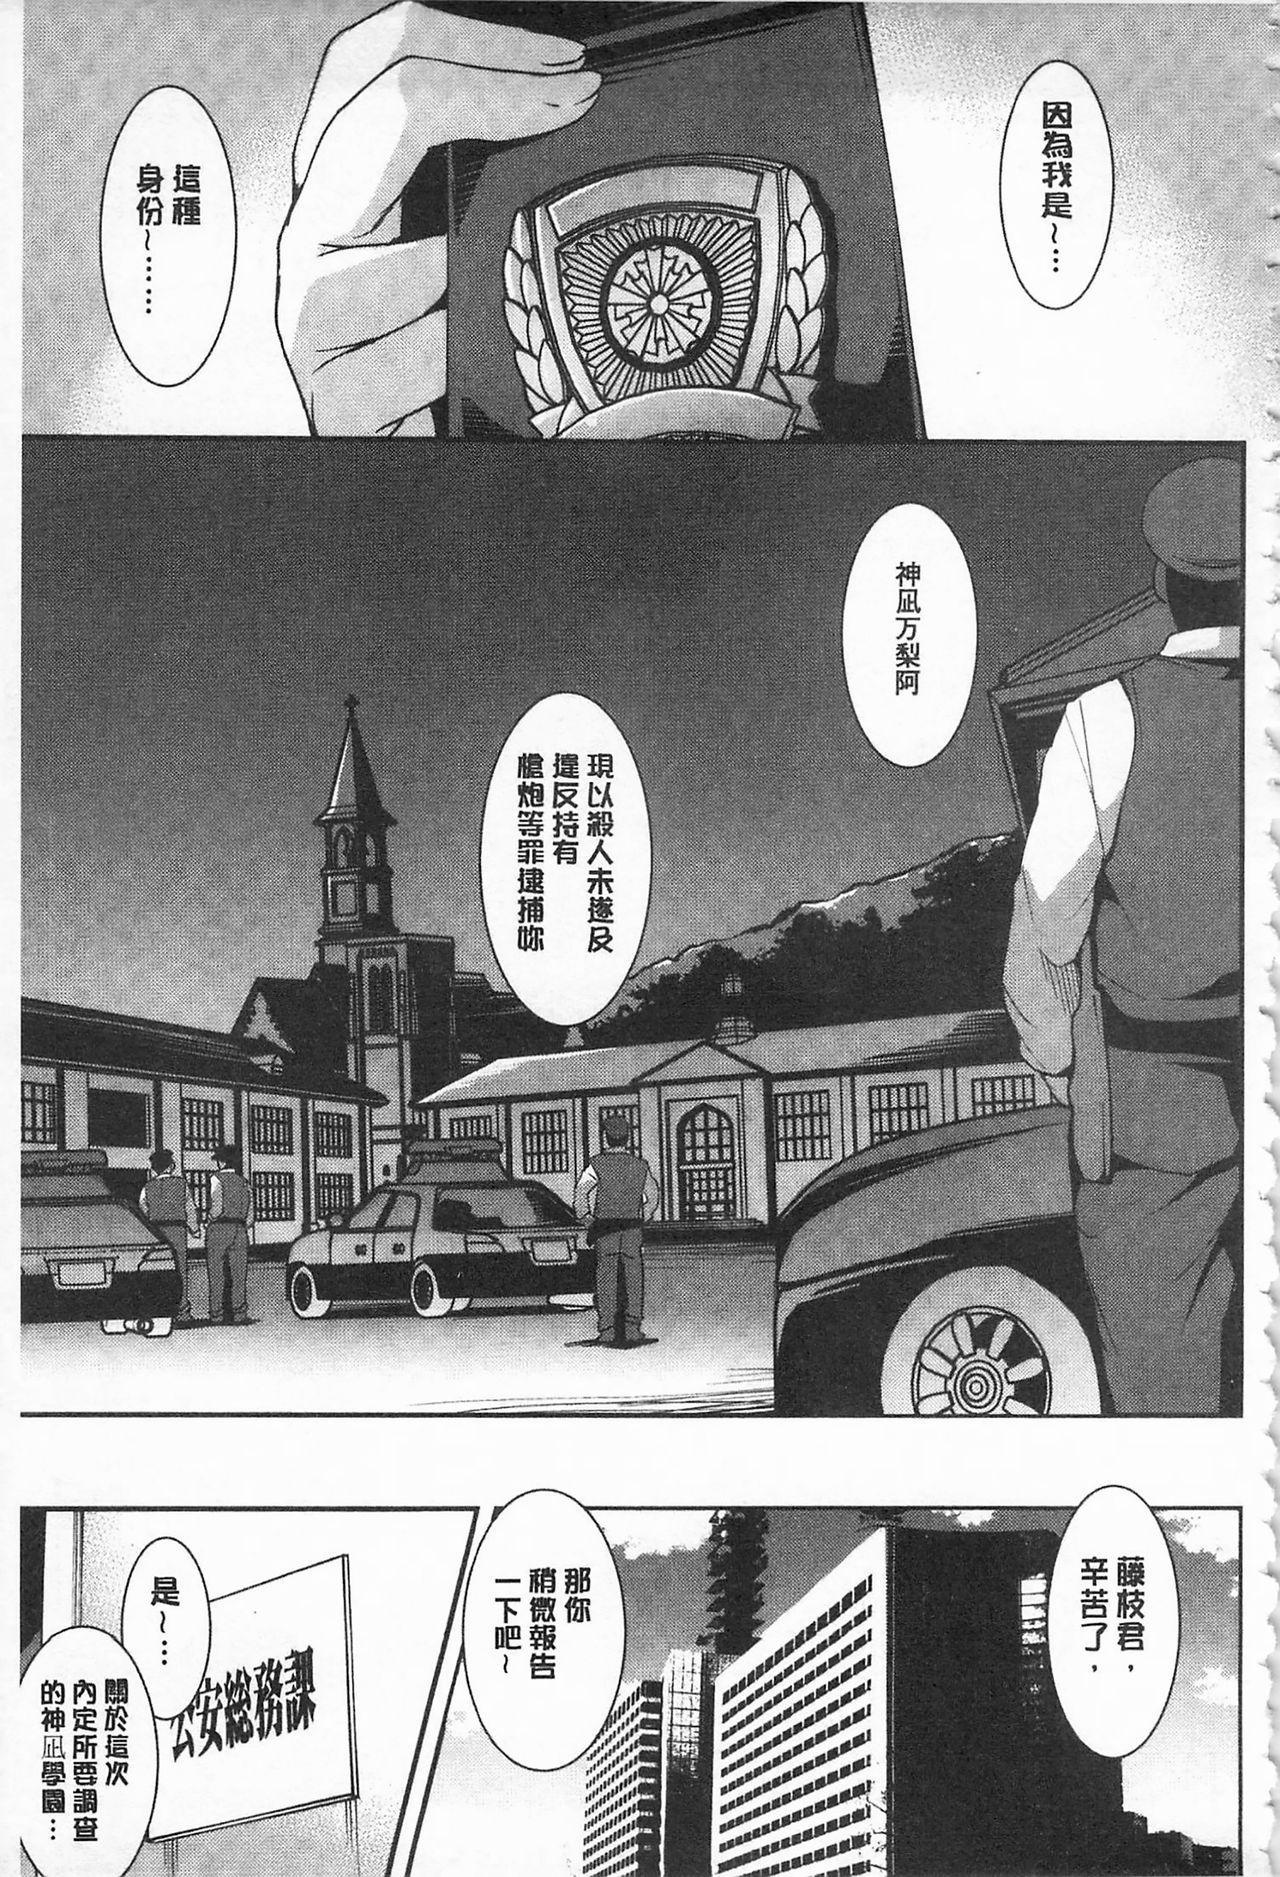 [Amano Kazumi] Seida Inyou -Seijo no Katachi Shita Intou- | 聖墮陰陽 -聖女的容貌與淫蕩- [Chinese] 152